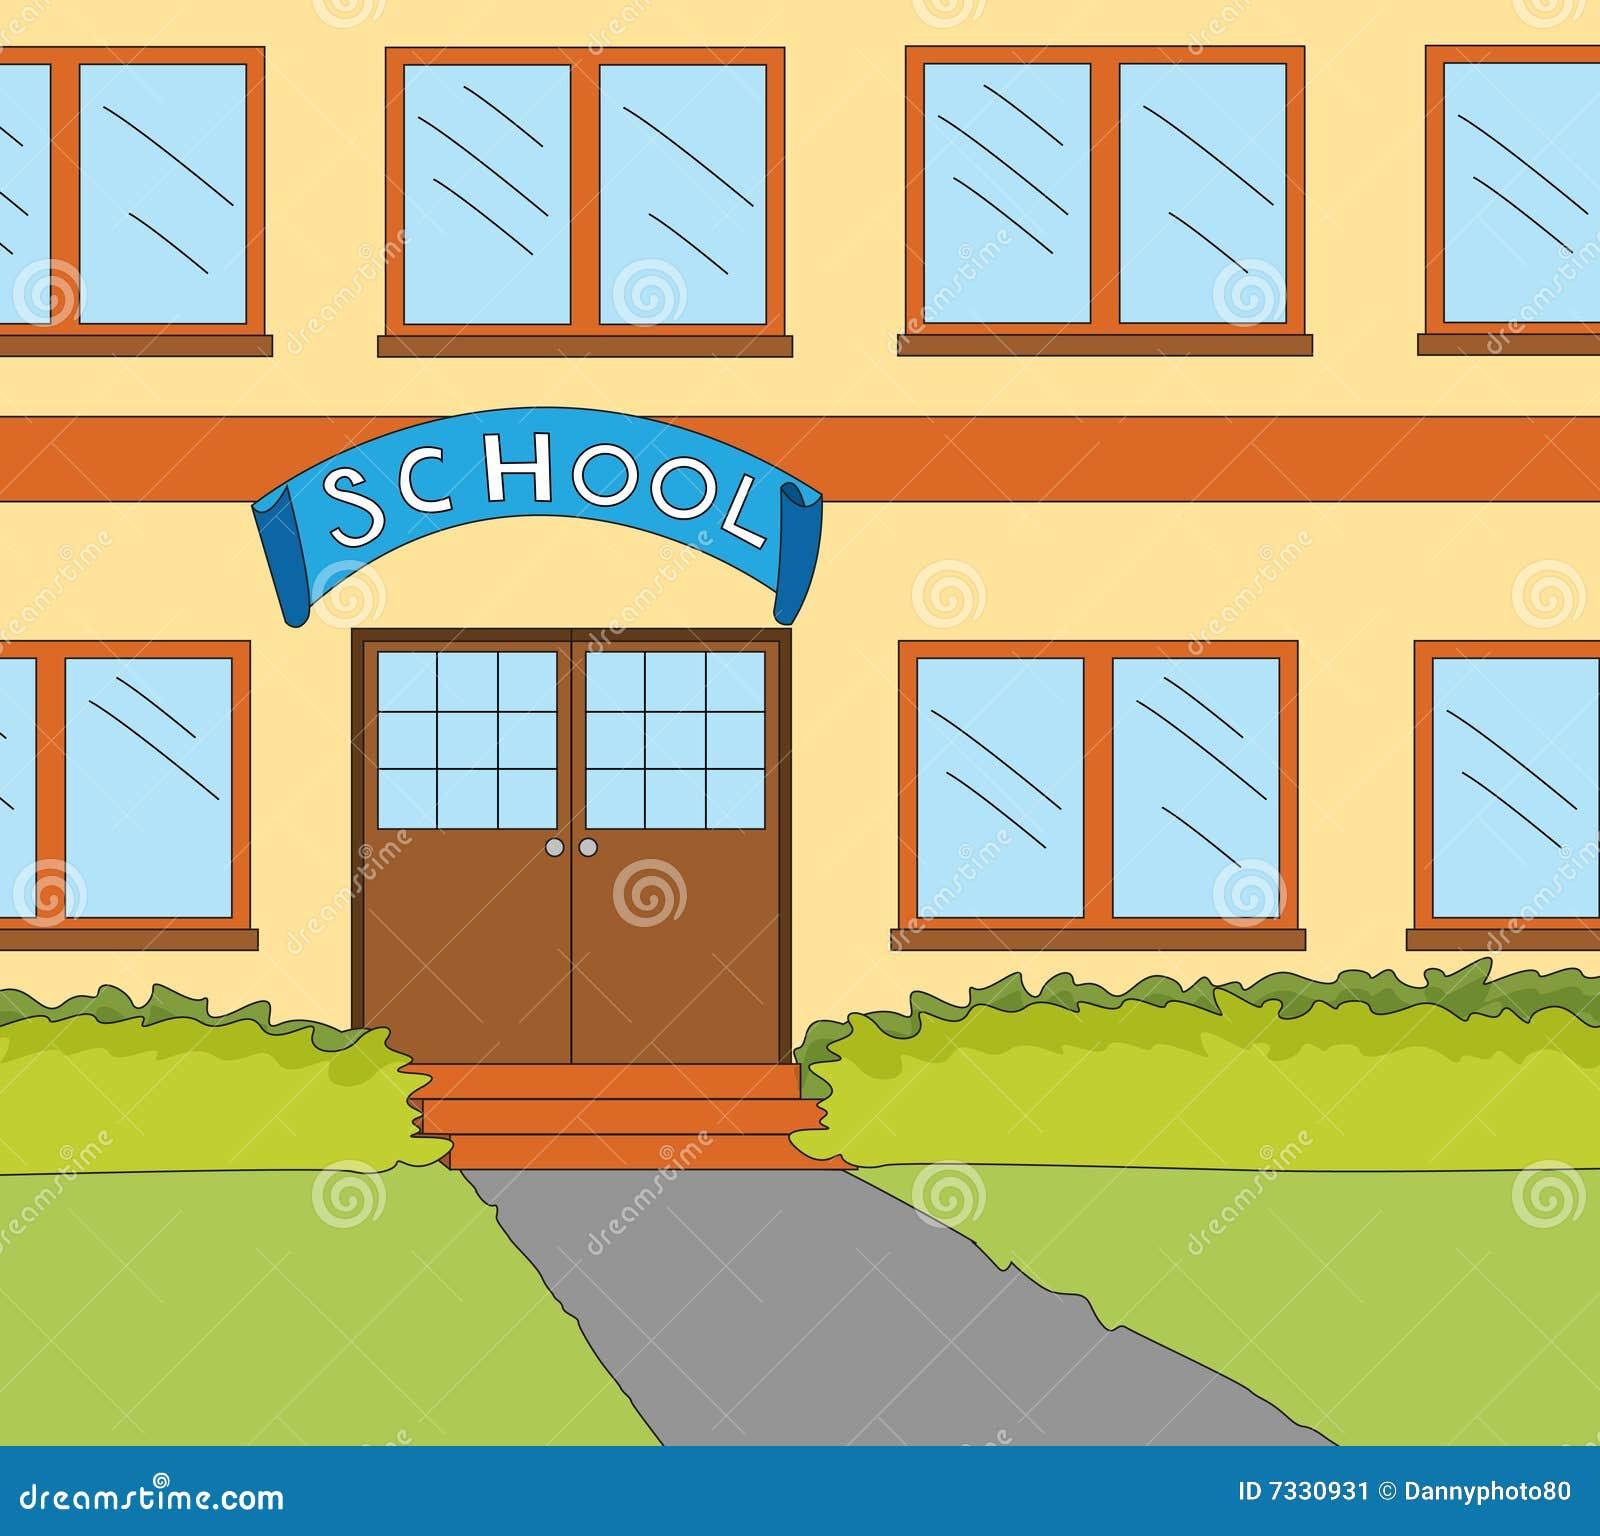 School Window Clipart school classroom window stock image - image: 7330931